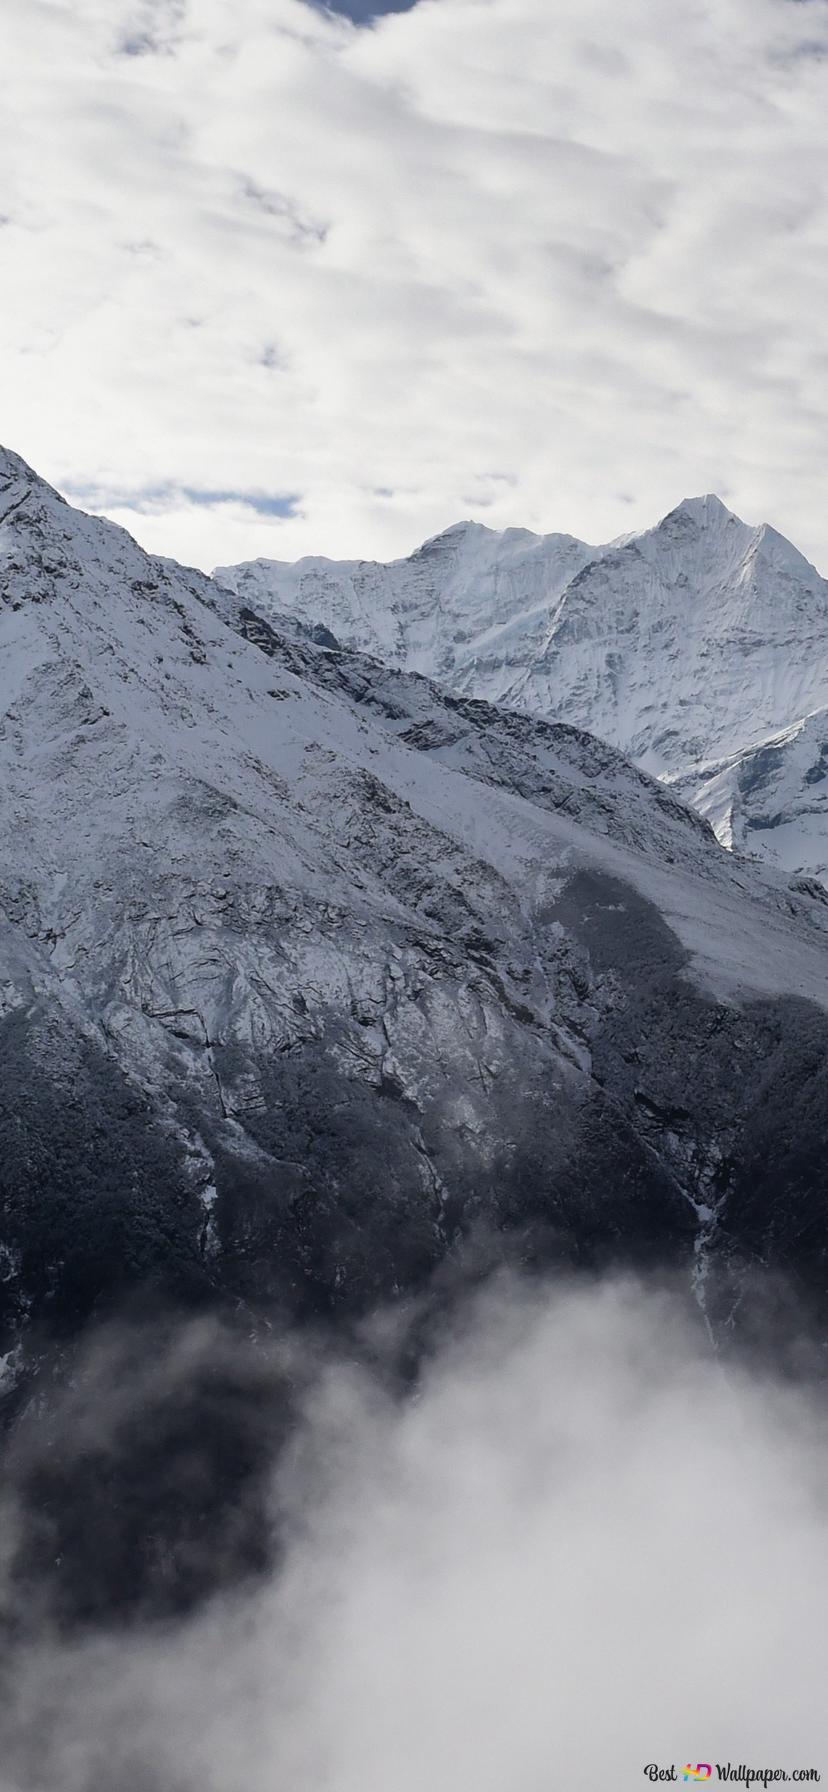 Winter Mountains Hd Wallpaper Download